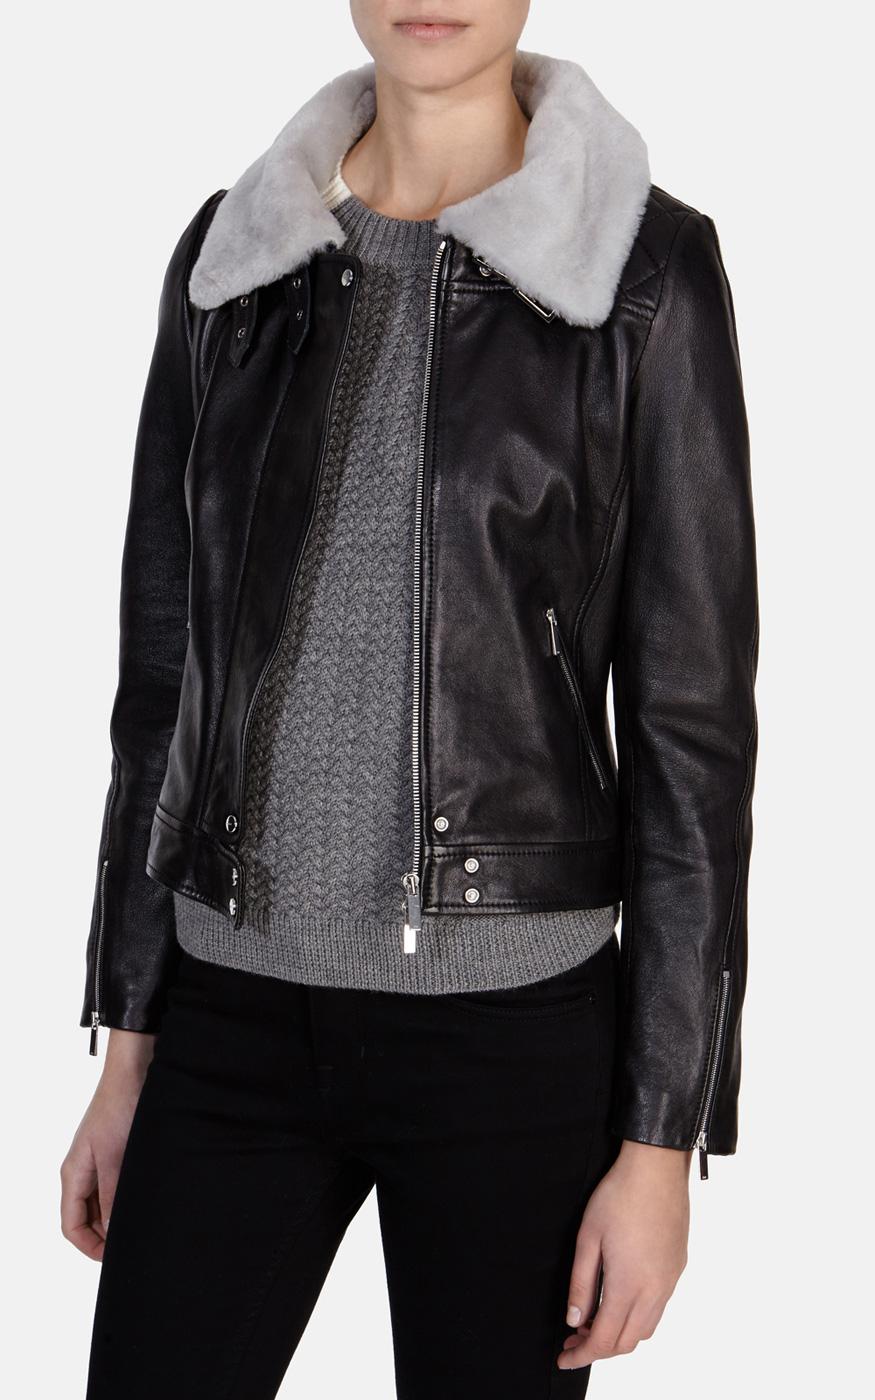 8b67ae482ab Karen Millen Leather Jacket with Fur Collar in Brown - Lyst